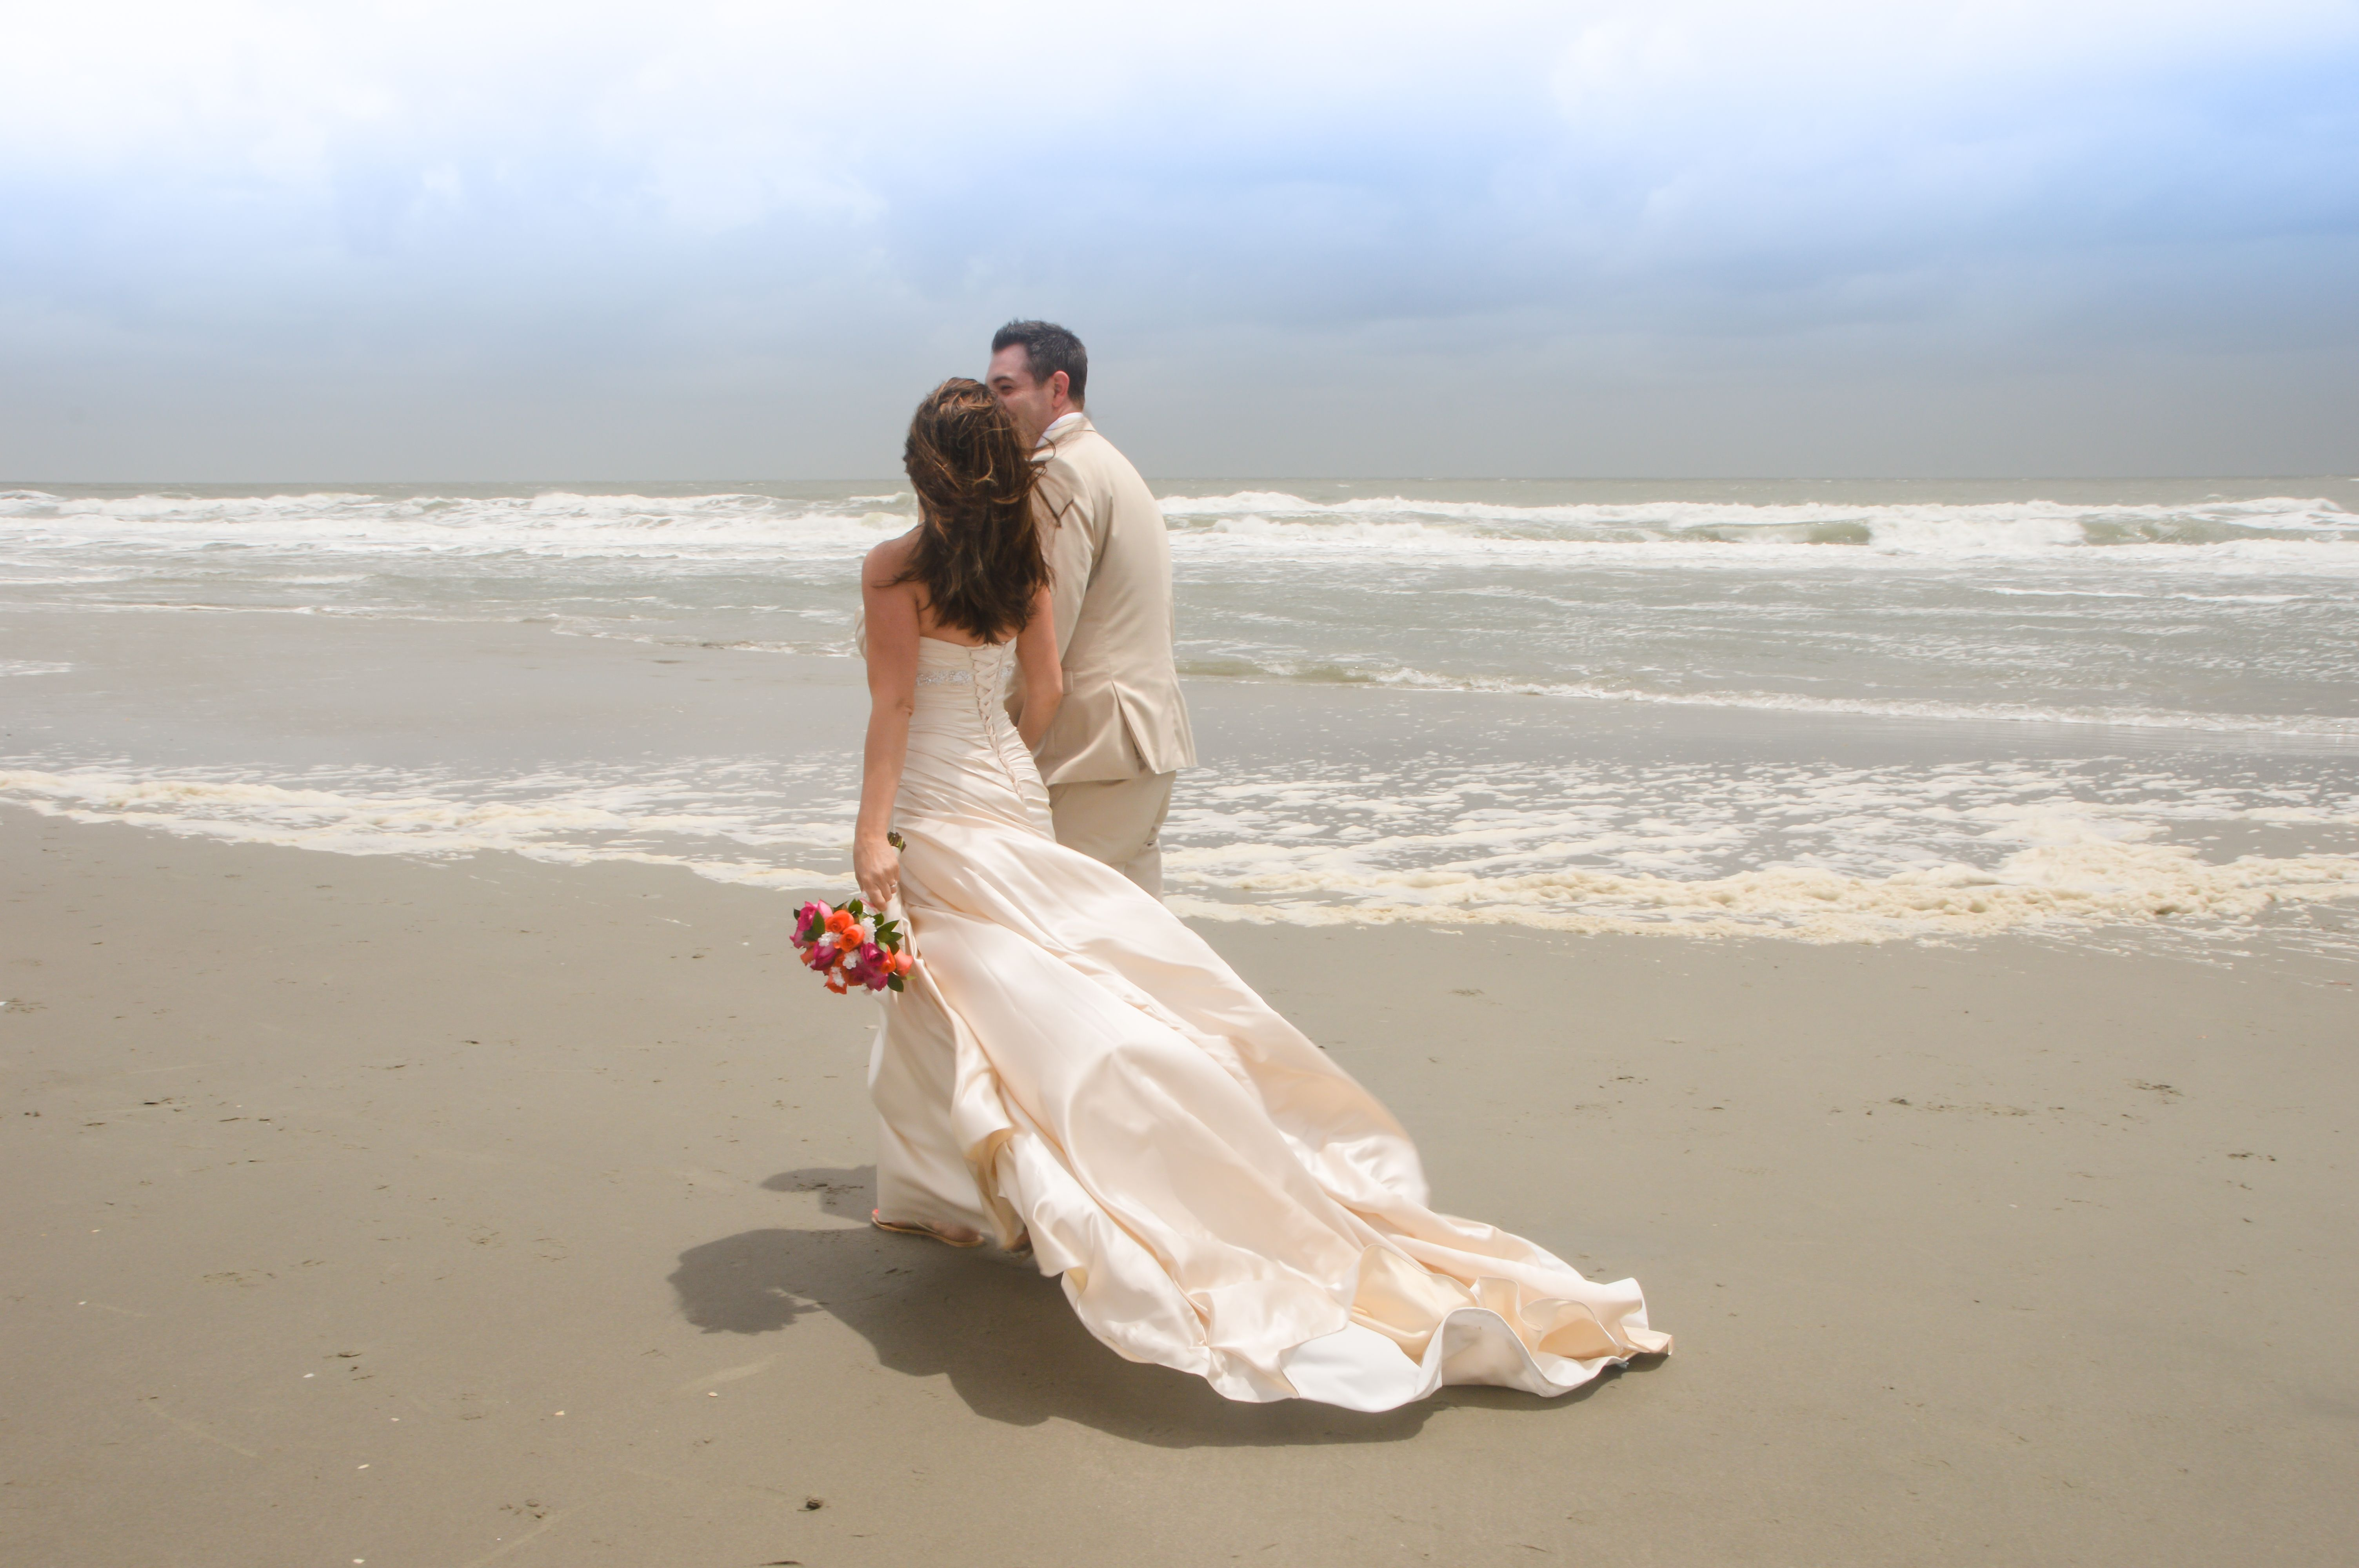 Sunrise beach wedding  Sabrina Blackburn billblackburn on Pinterest